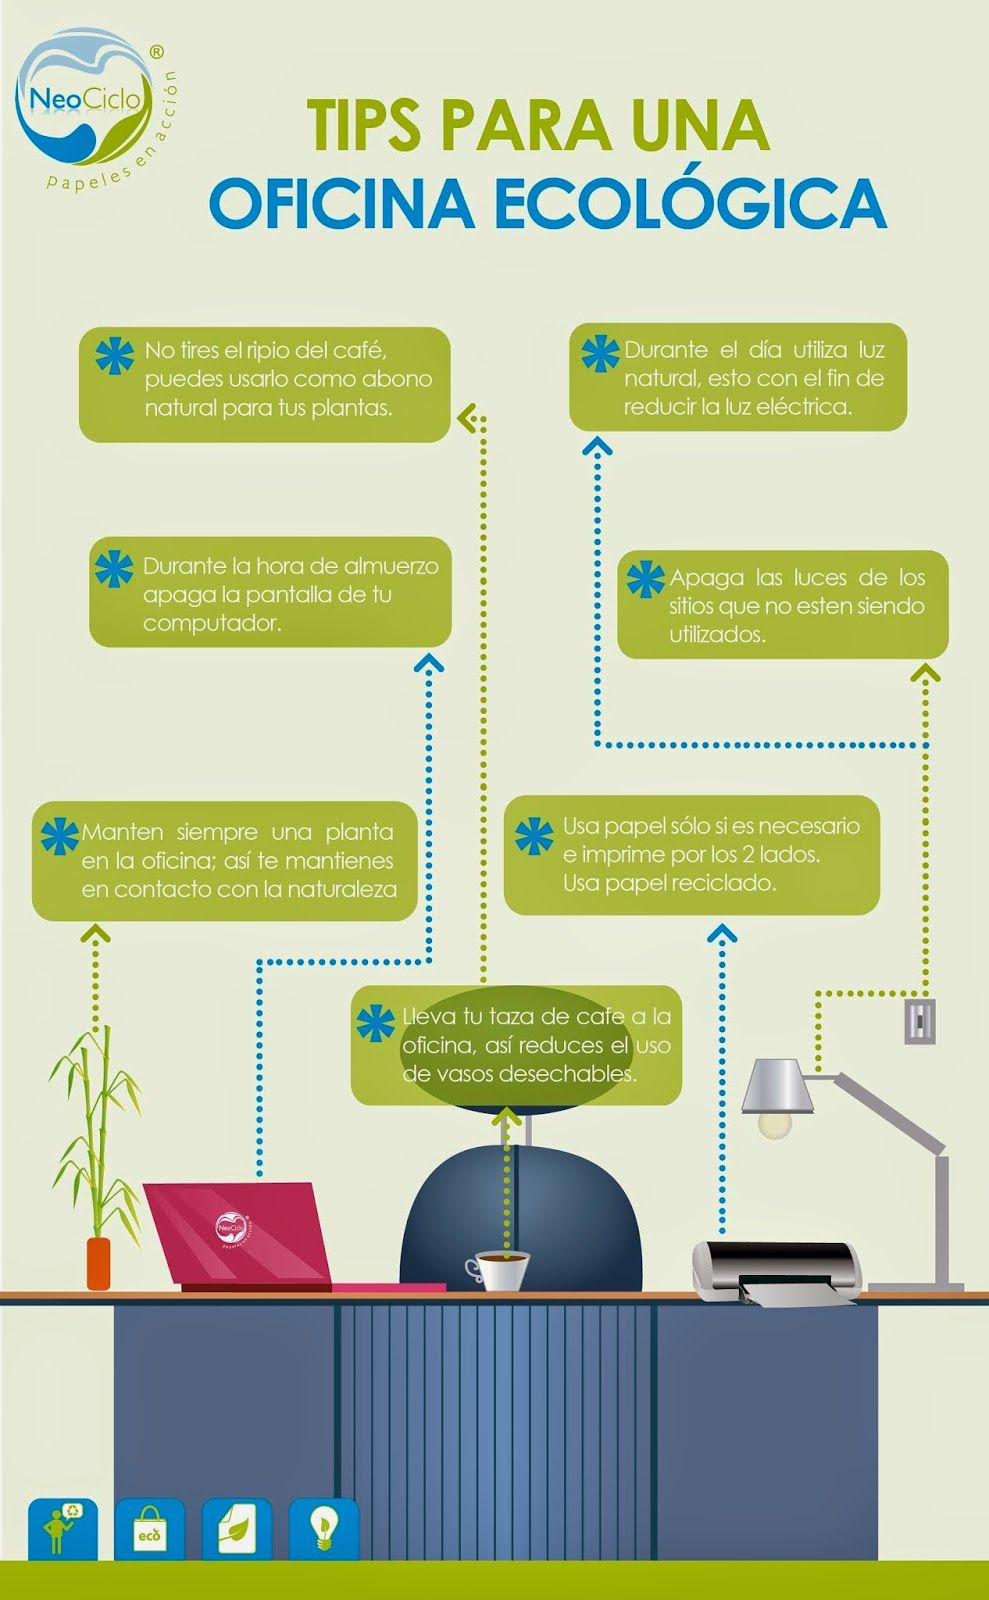 Tips oficina ecologica 989 1600 info verde for Red de una oficina